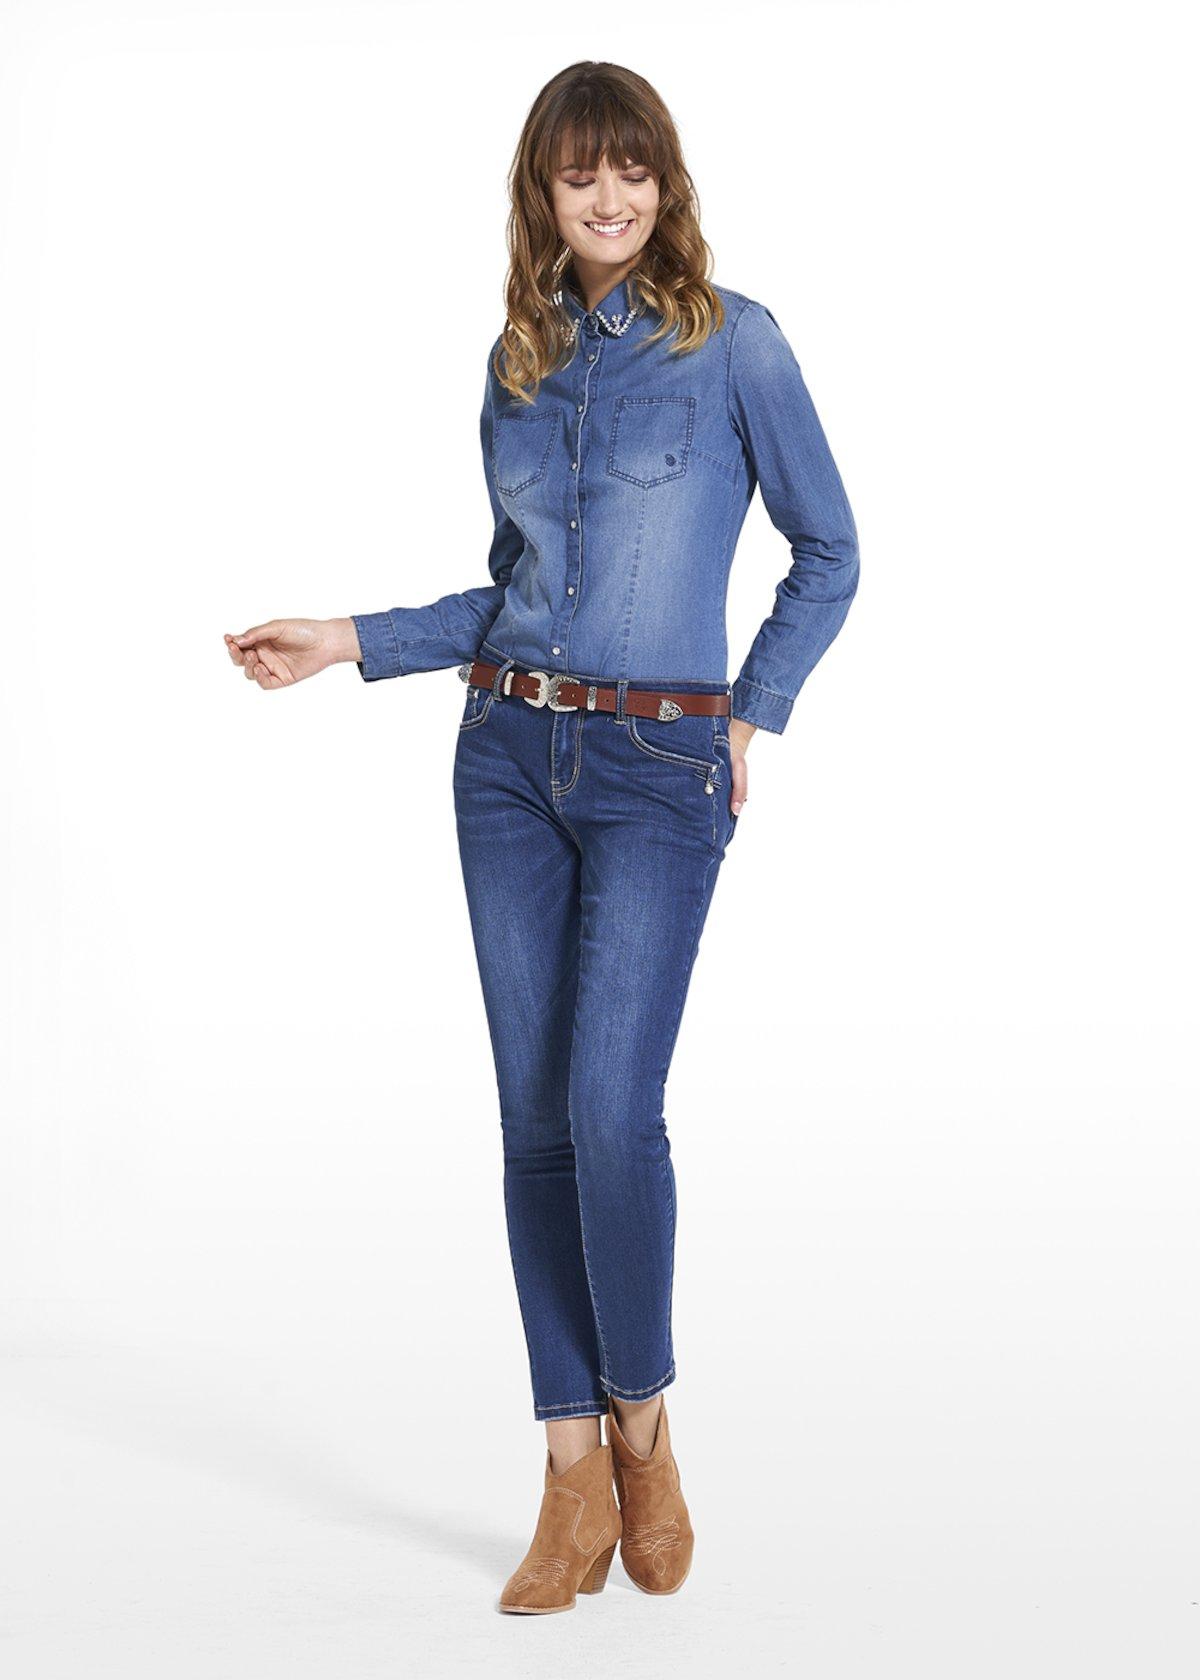 5-pocket skinny leg pants with a grosgrain ribbon detail